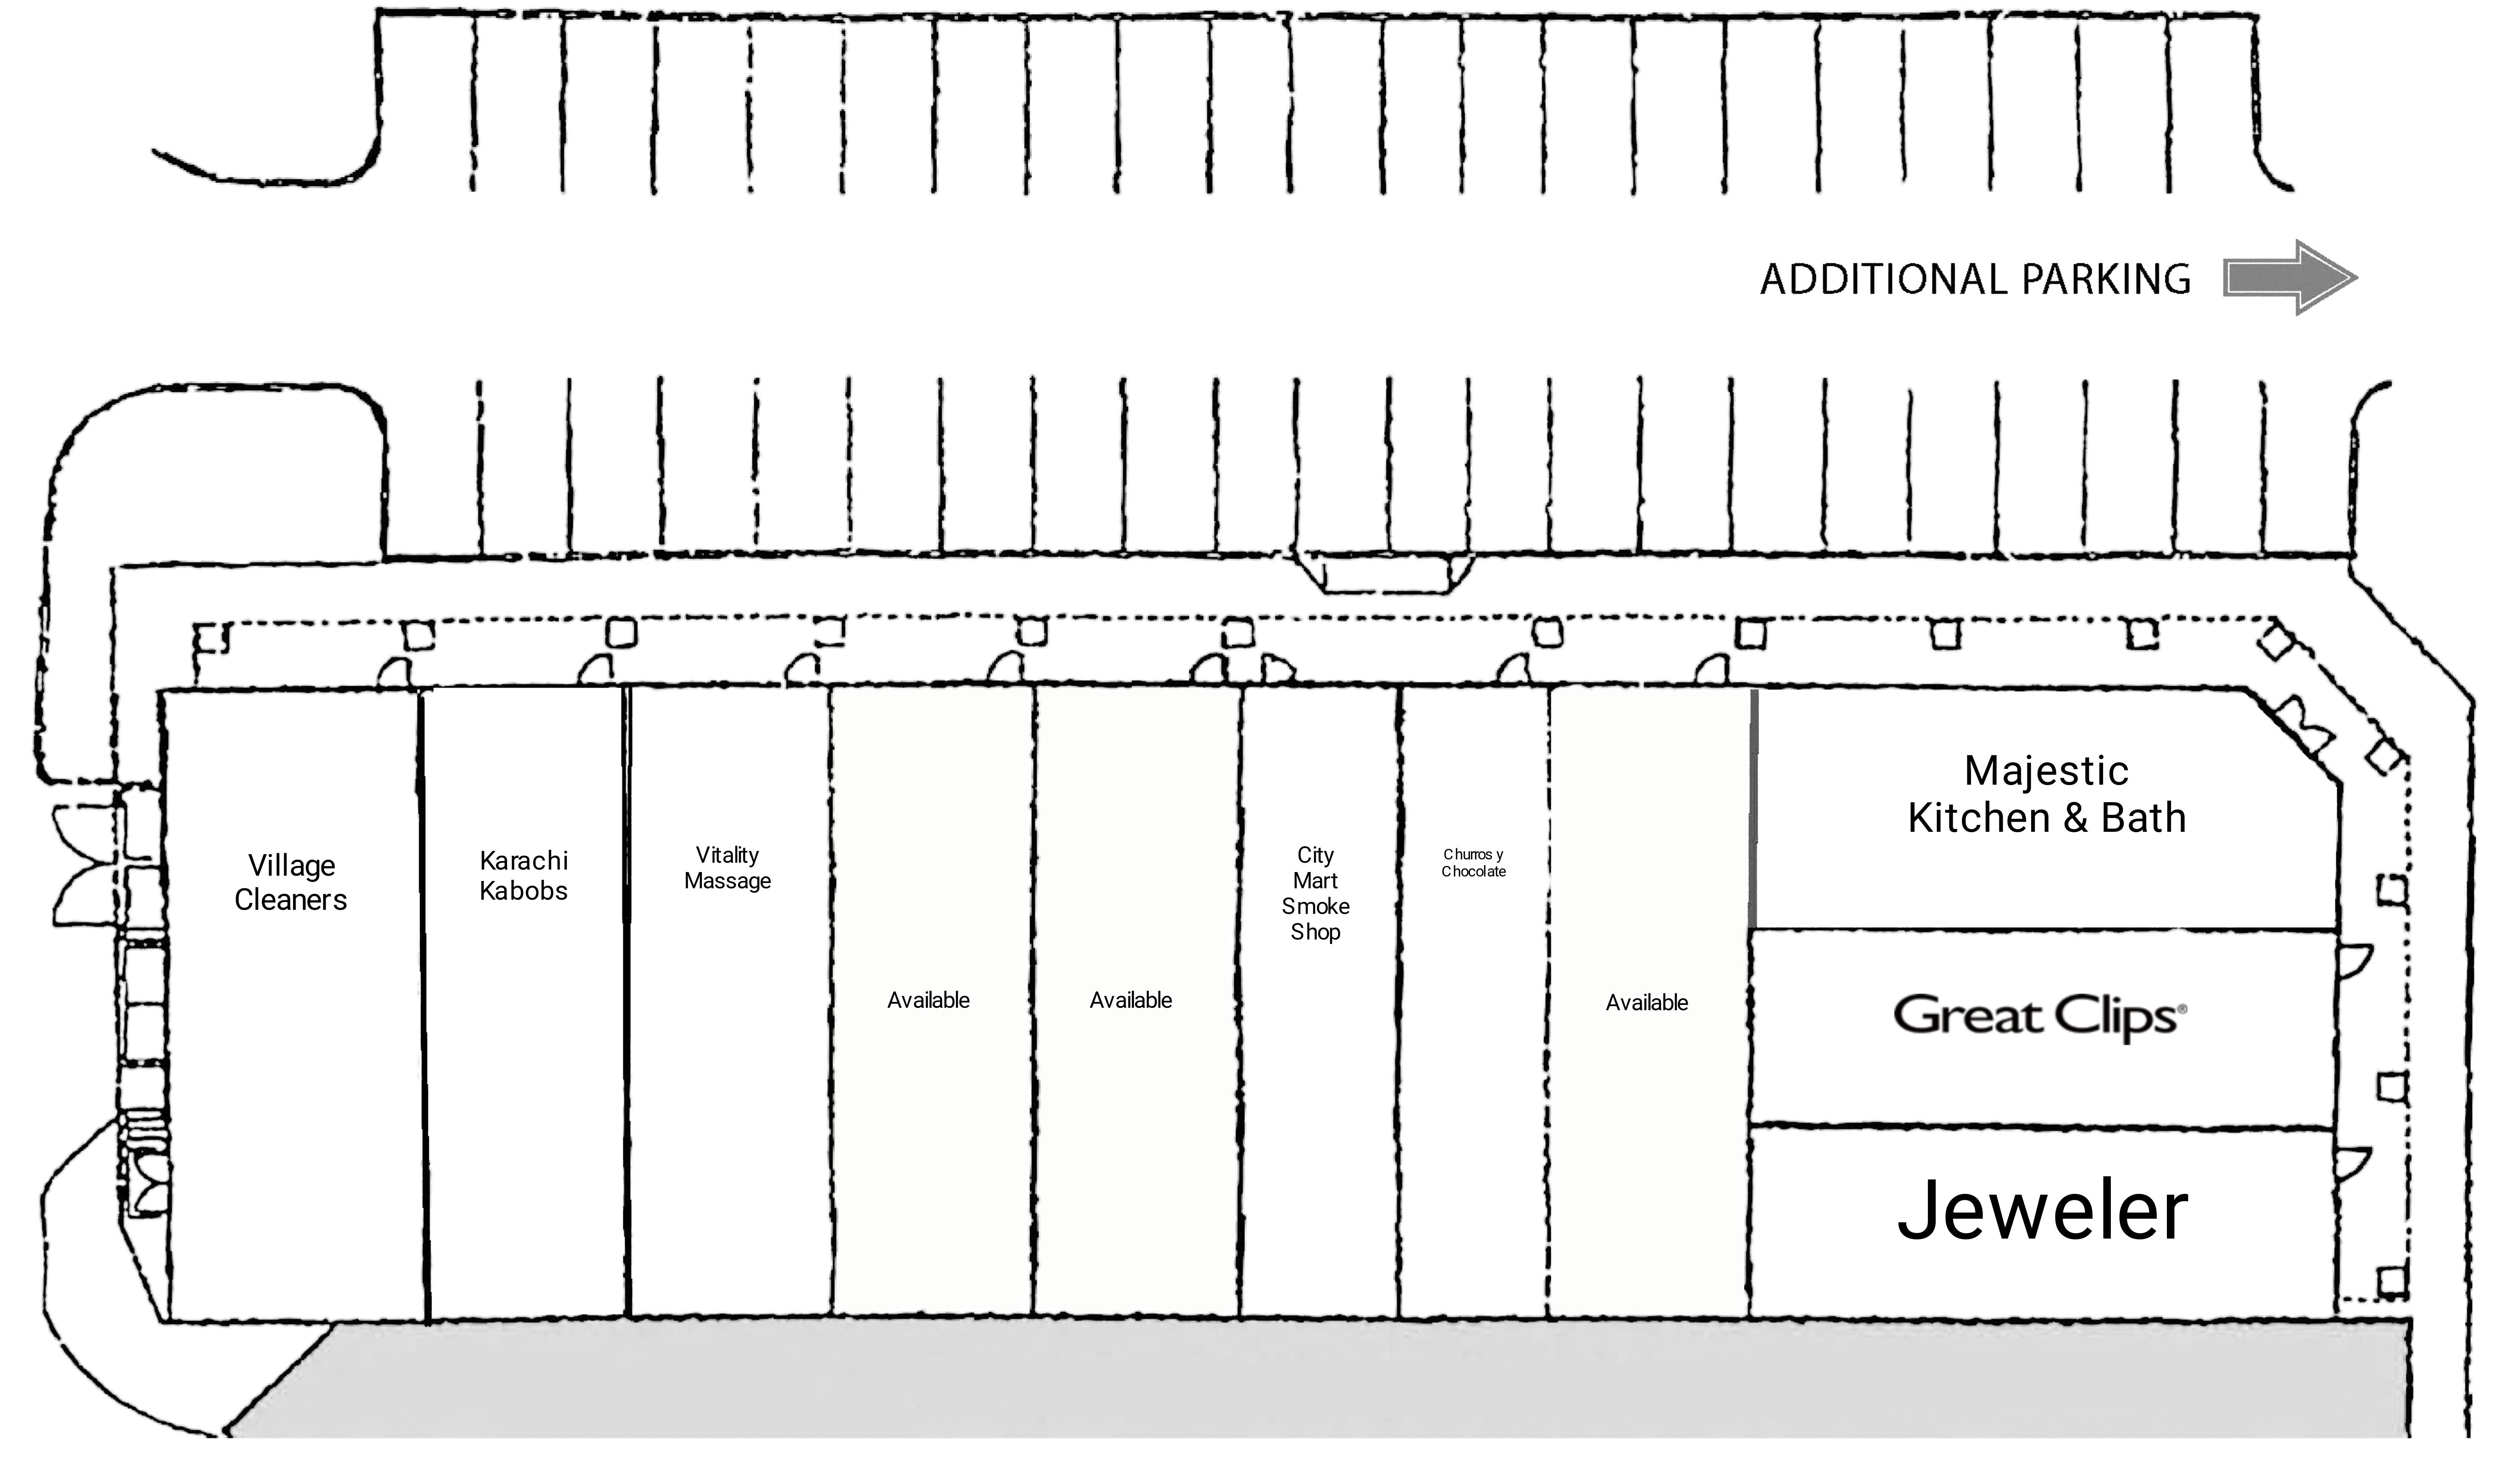 Algonquin Randall Plaza: site plan